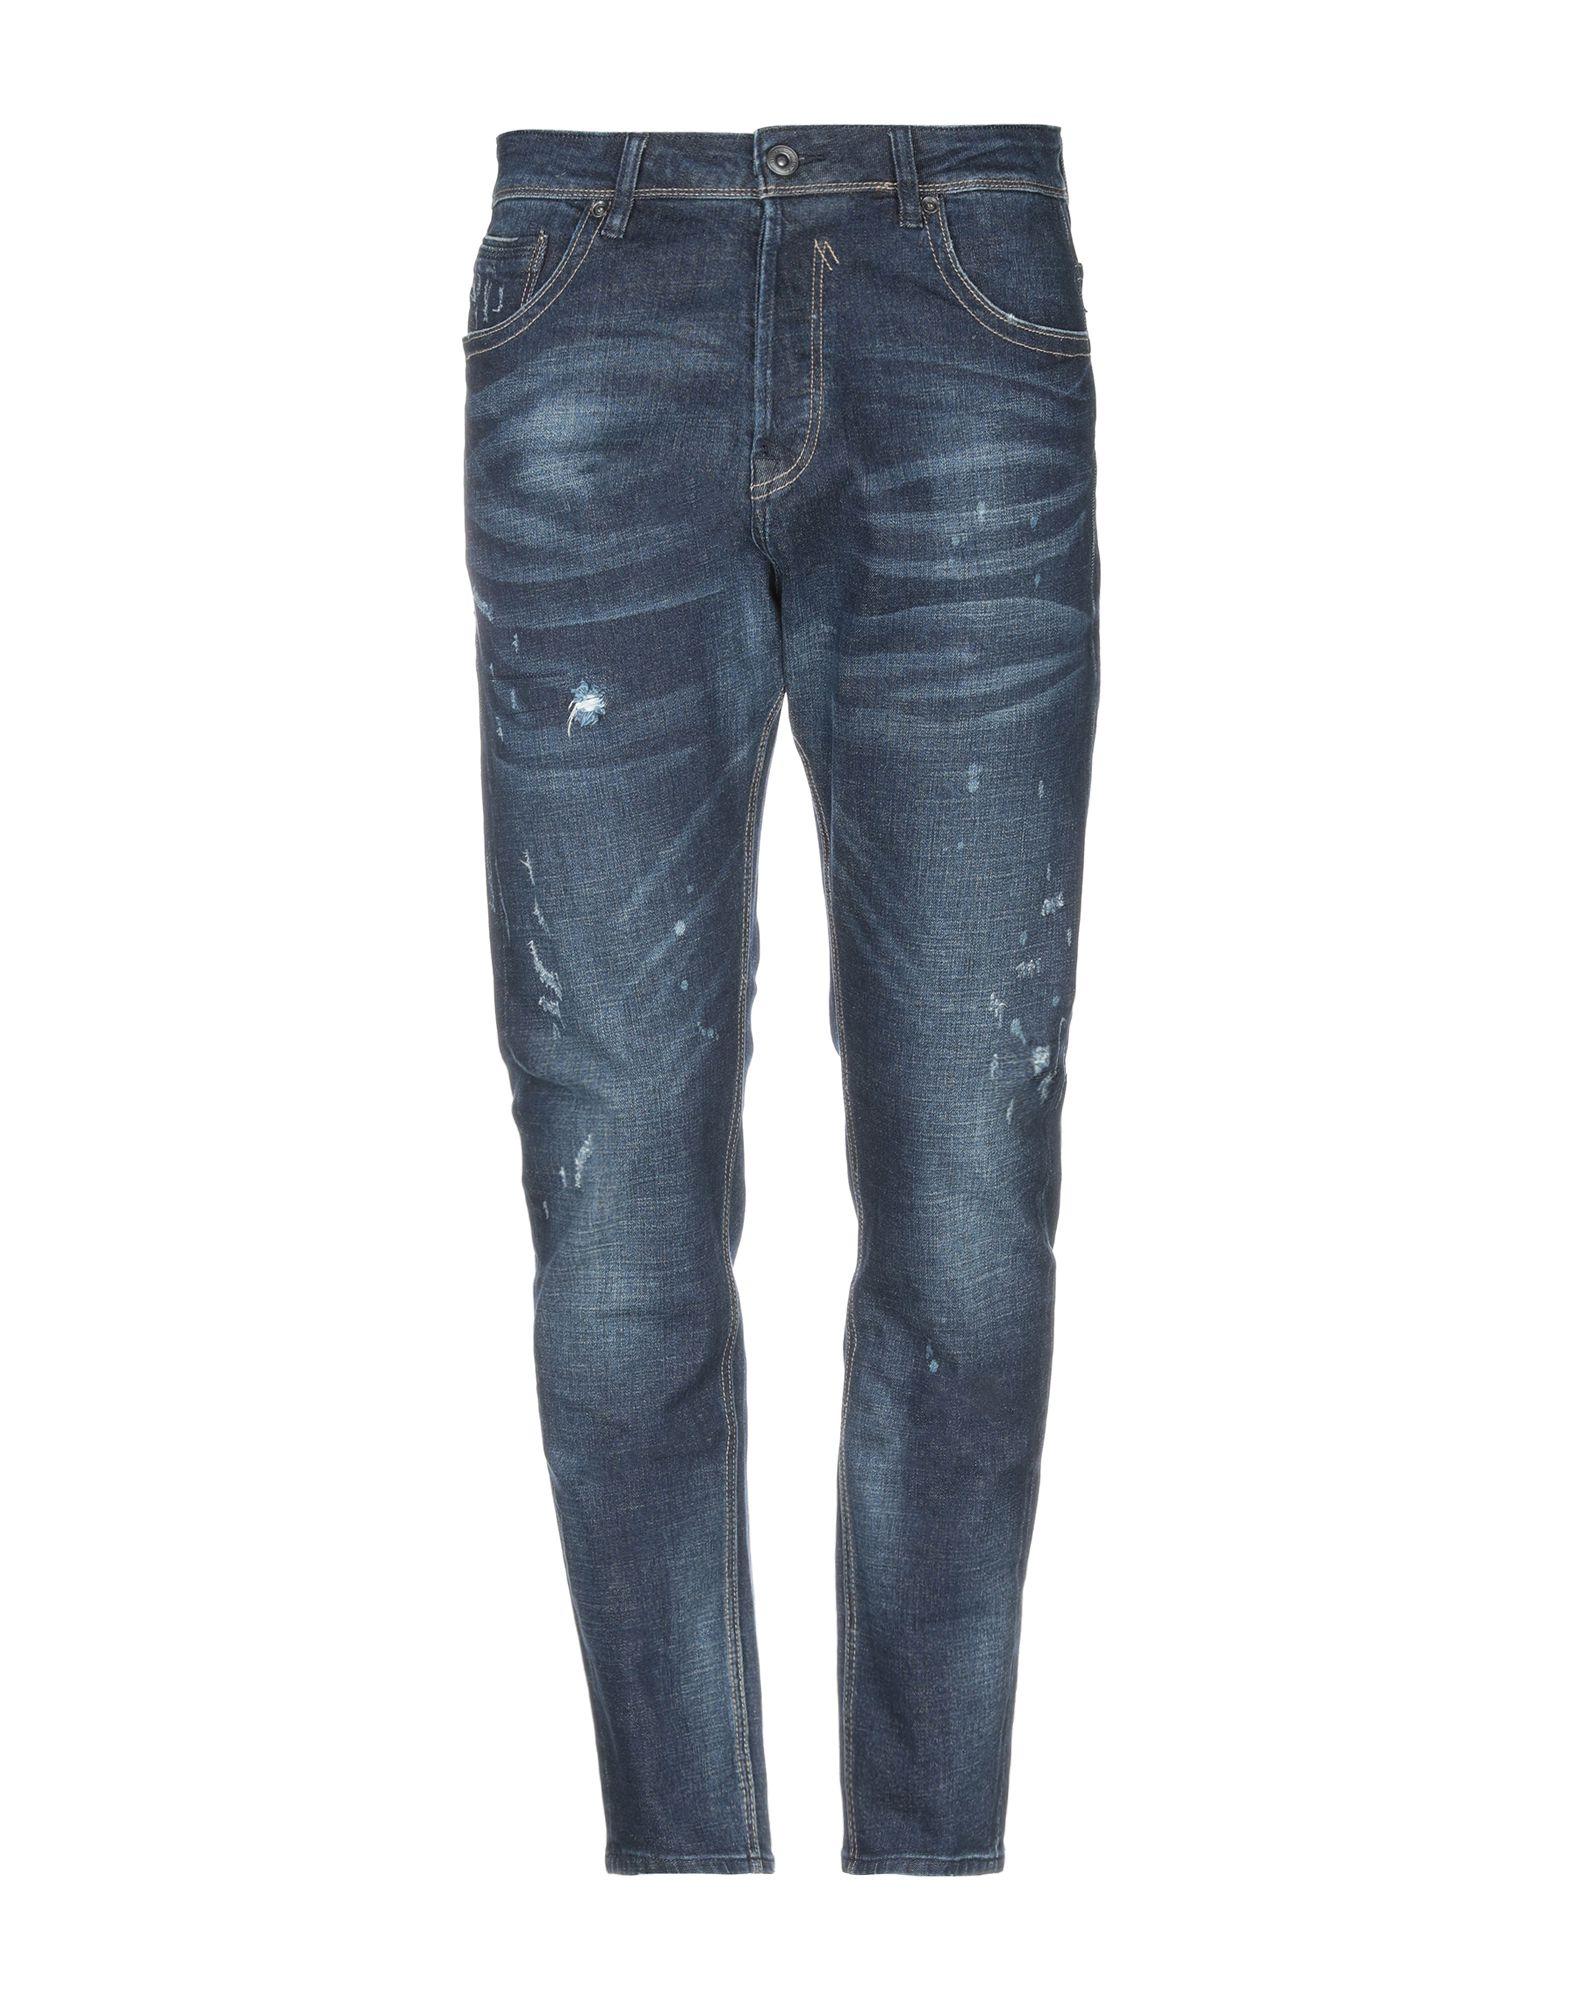 GIANNI LUPO Herren Jeanshose Farbe Blau Größe 6